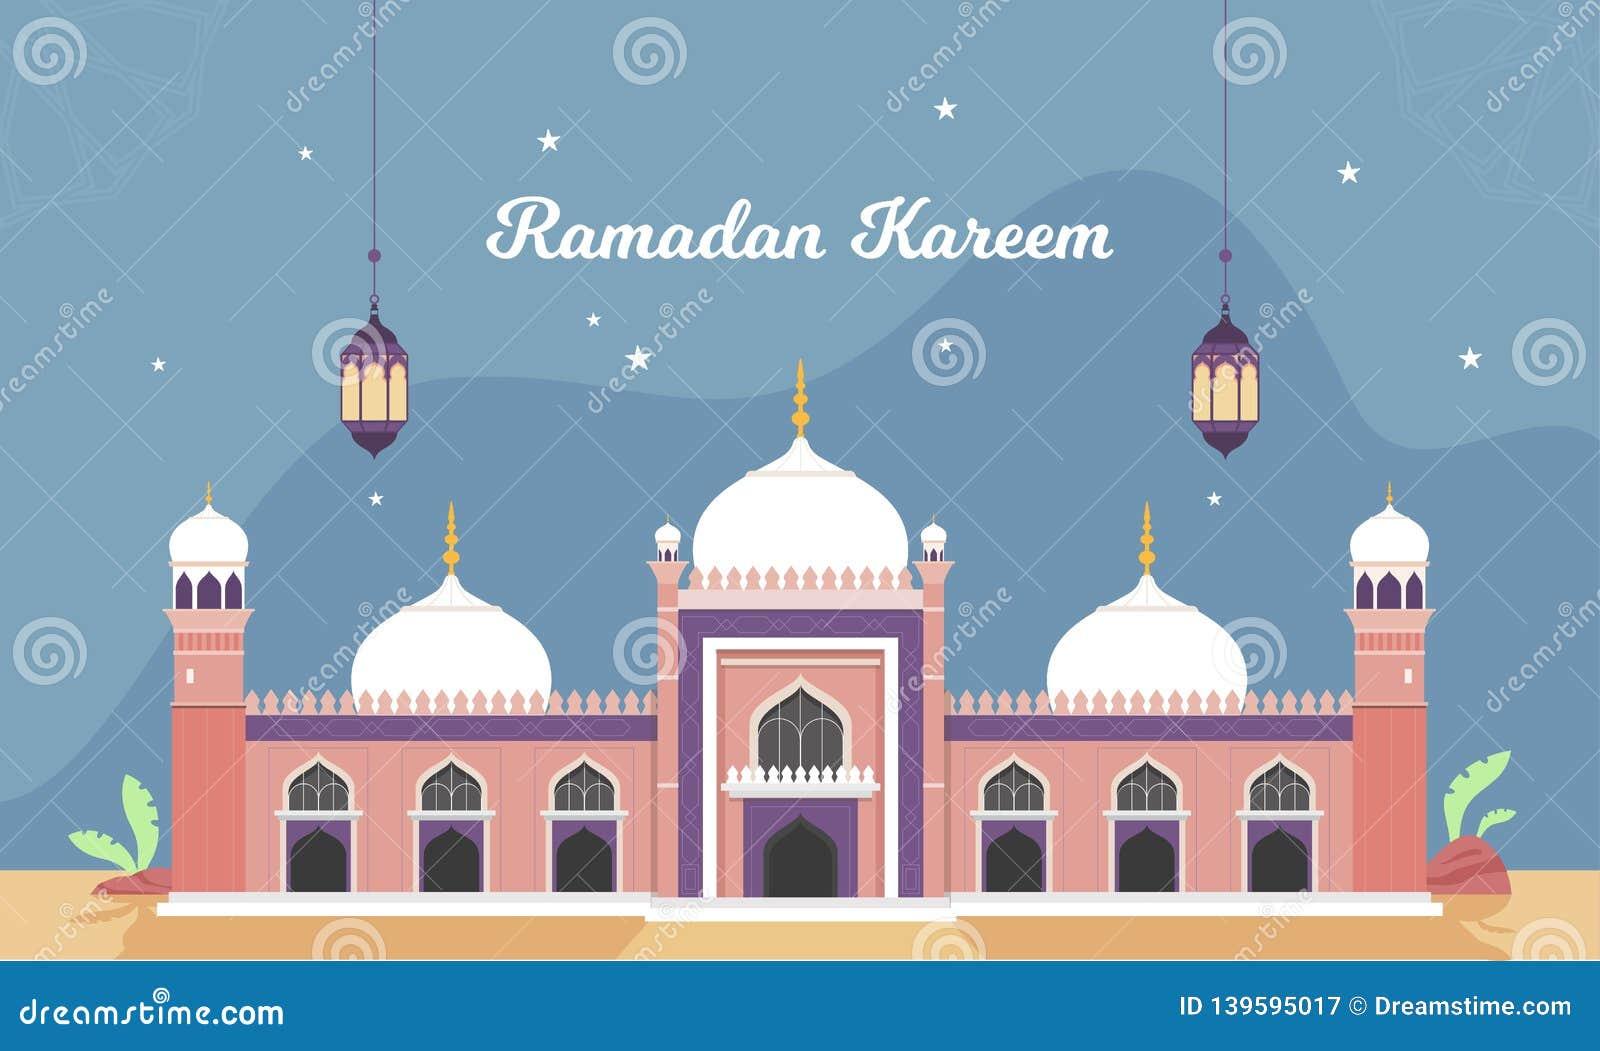 Ramadan Vector Illustration with lantern and crescent moon